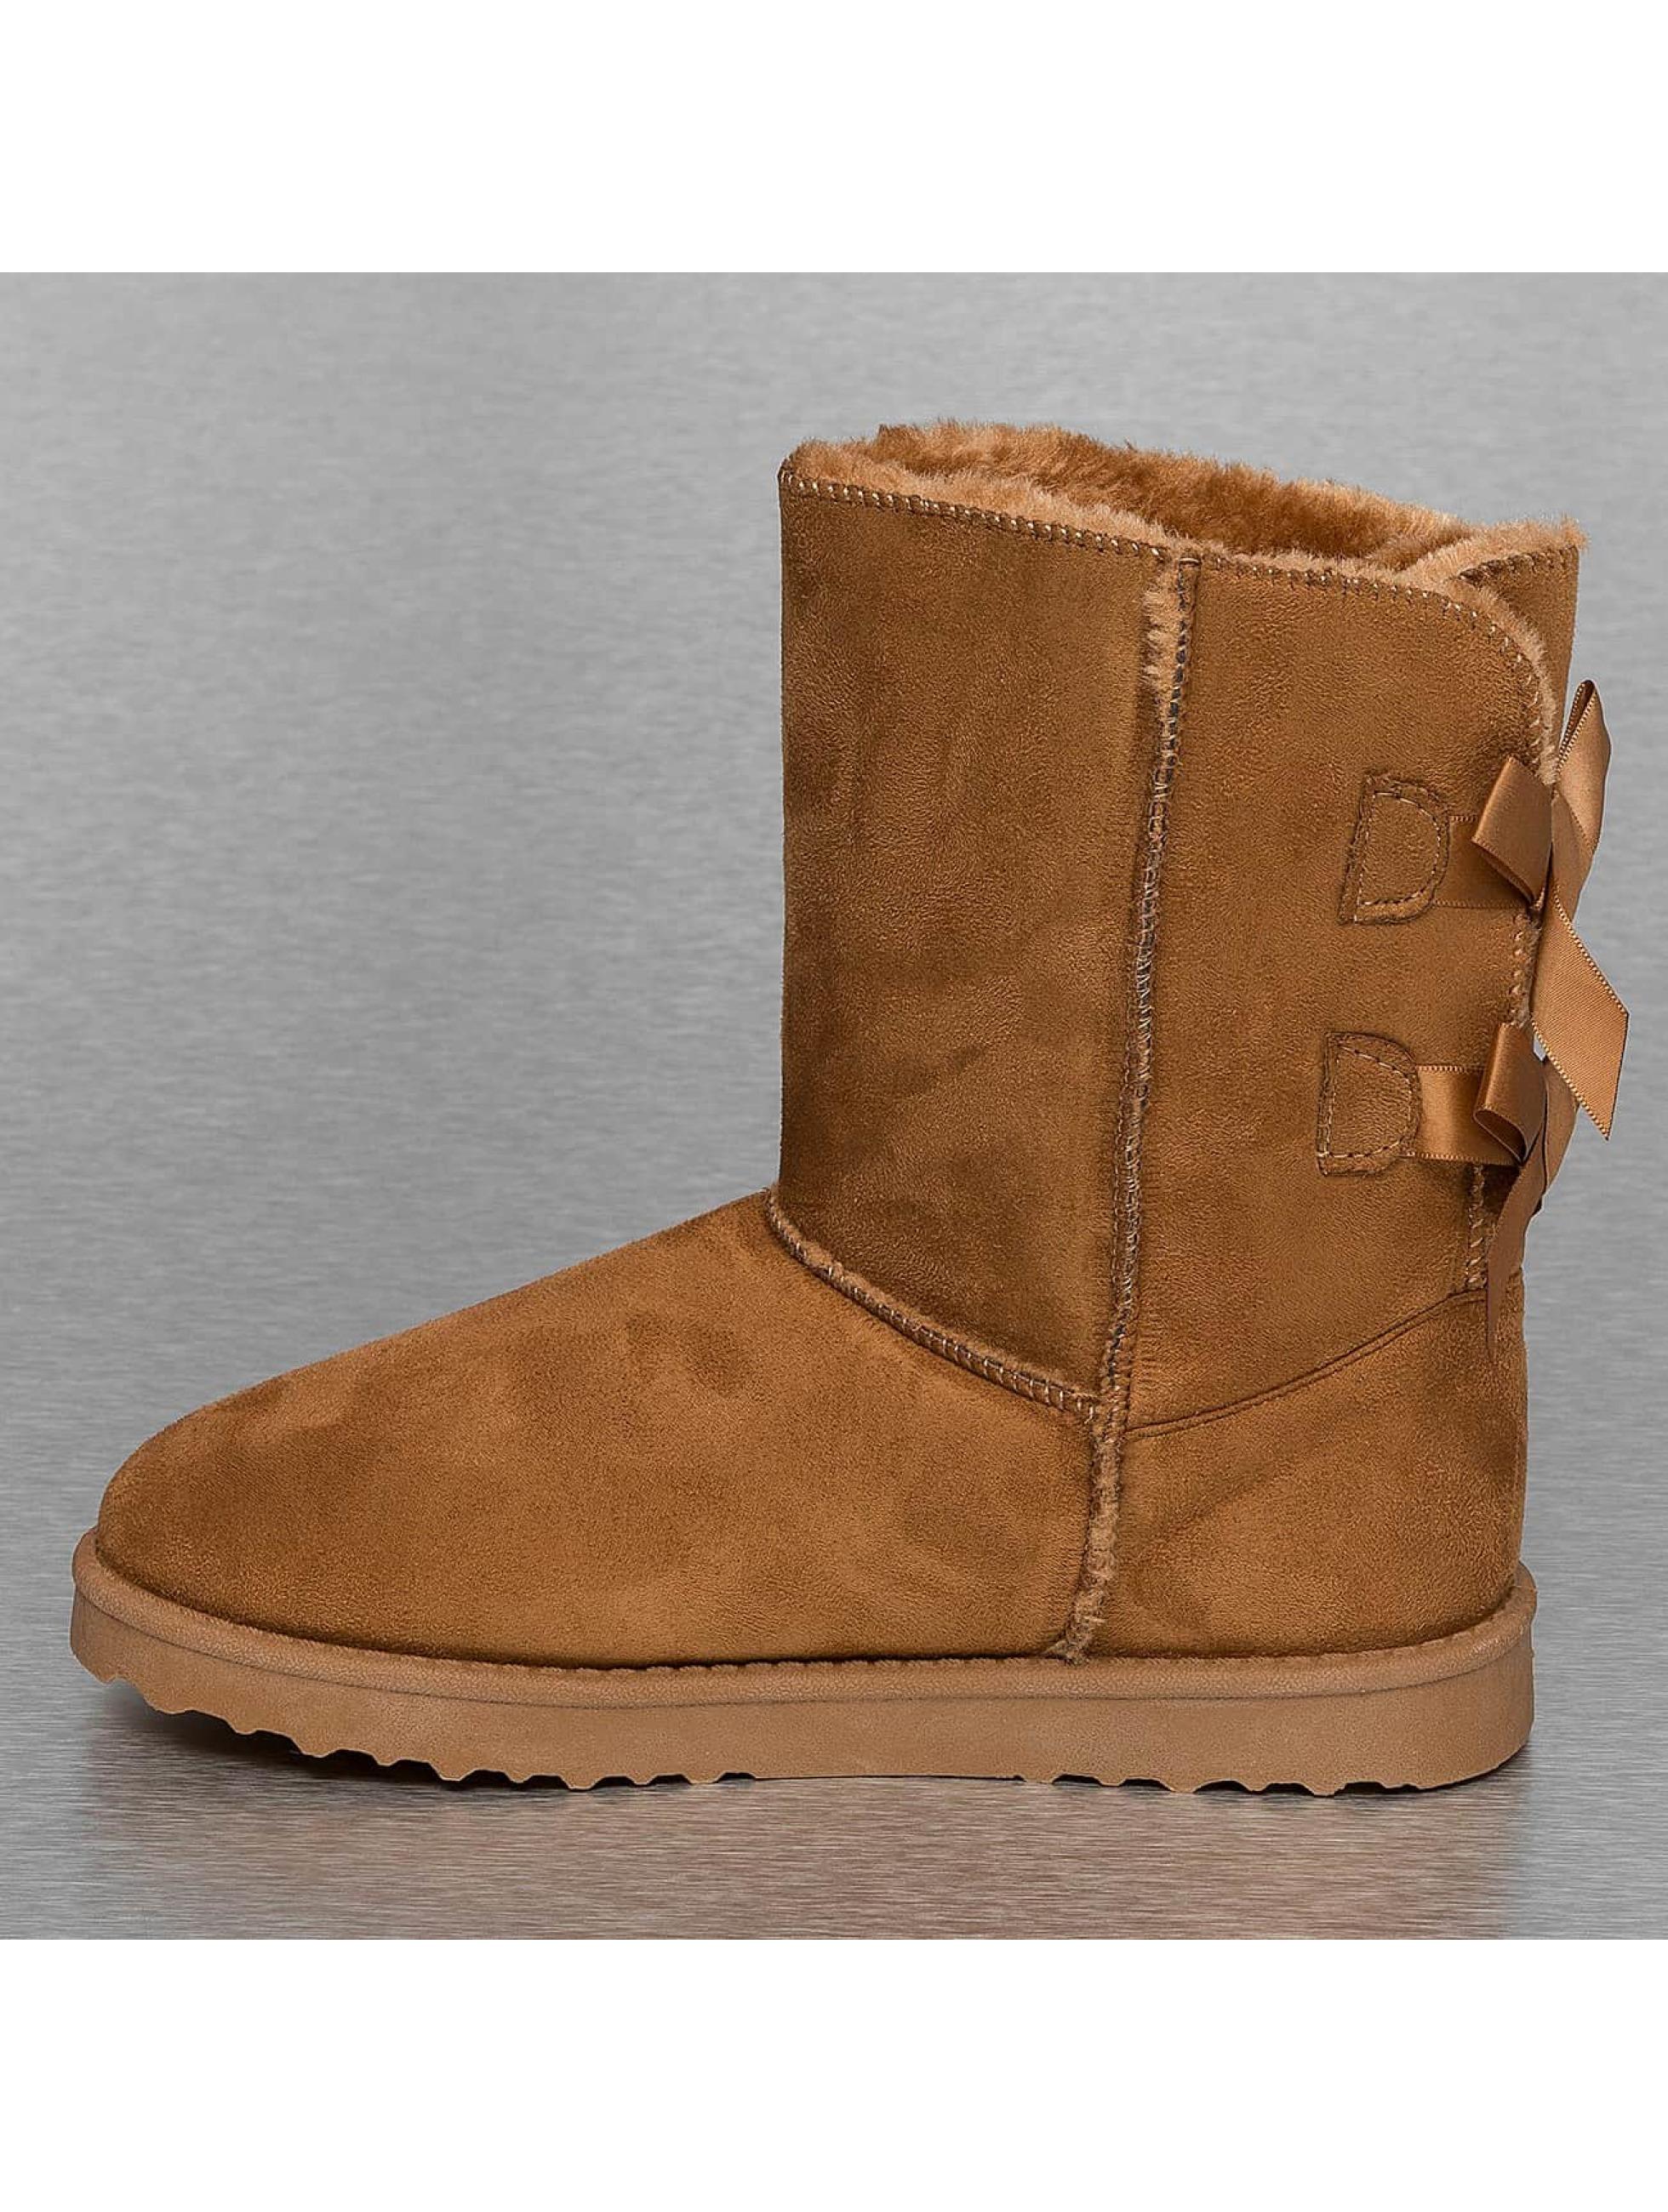 Jumex-Donne-Scarpe-Boots-Basic-High